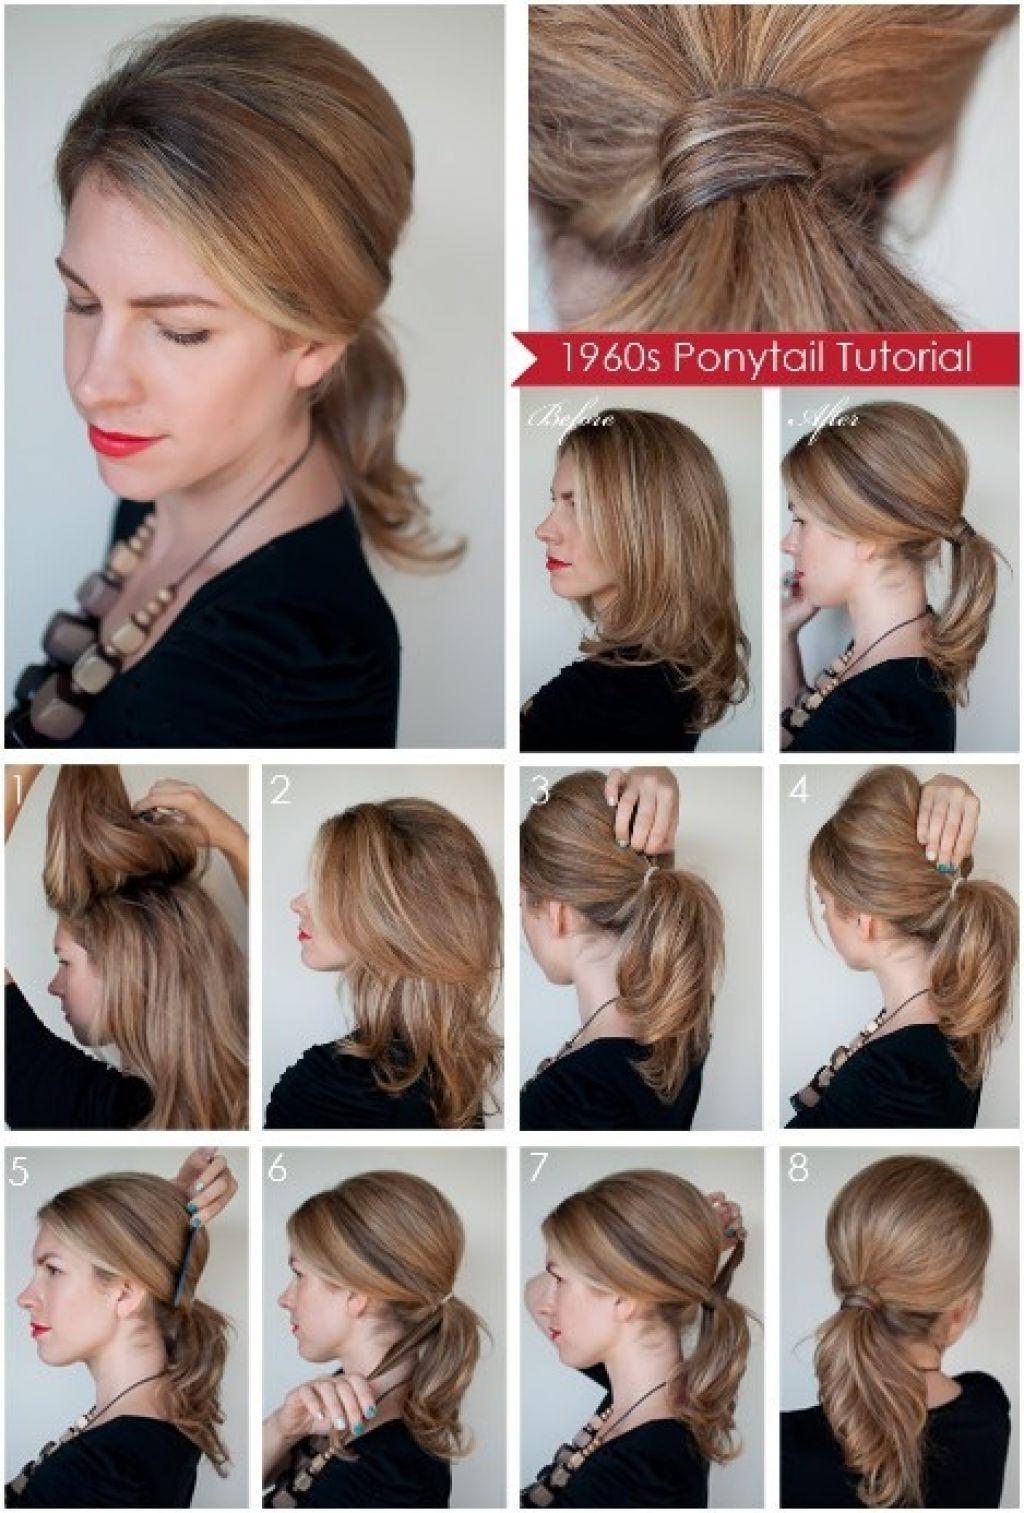 Diy Ponytail Hairstyles For Medium Long Hair Within Most Current Ponytail Hairstyles For Layered Hair (View 6 of 20)